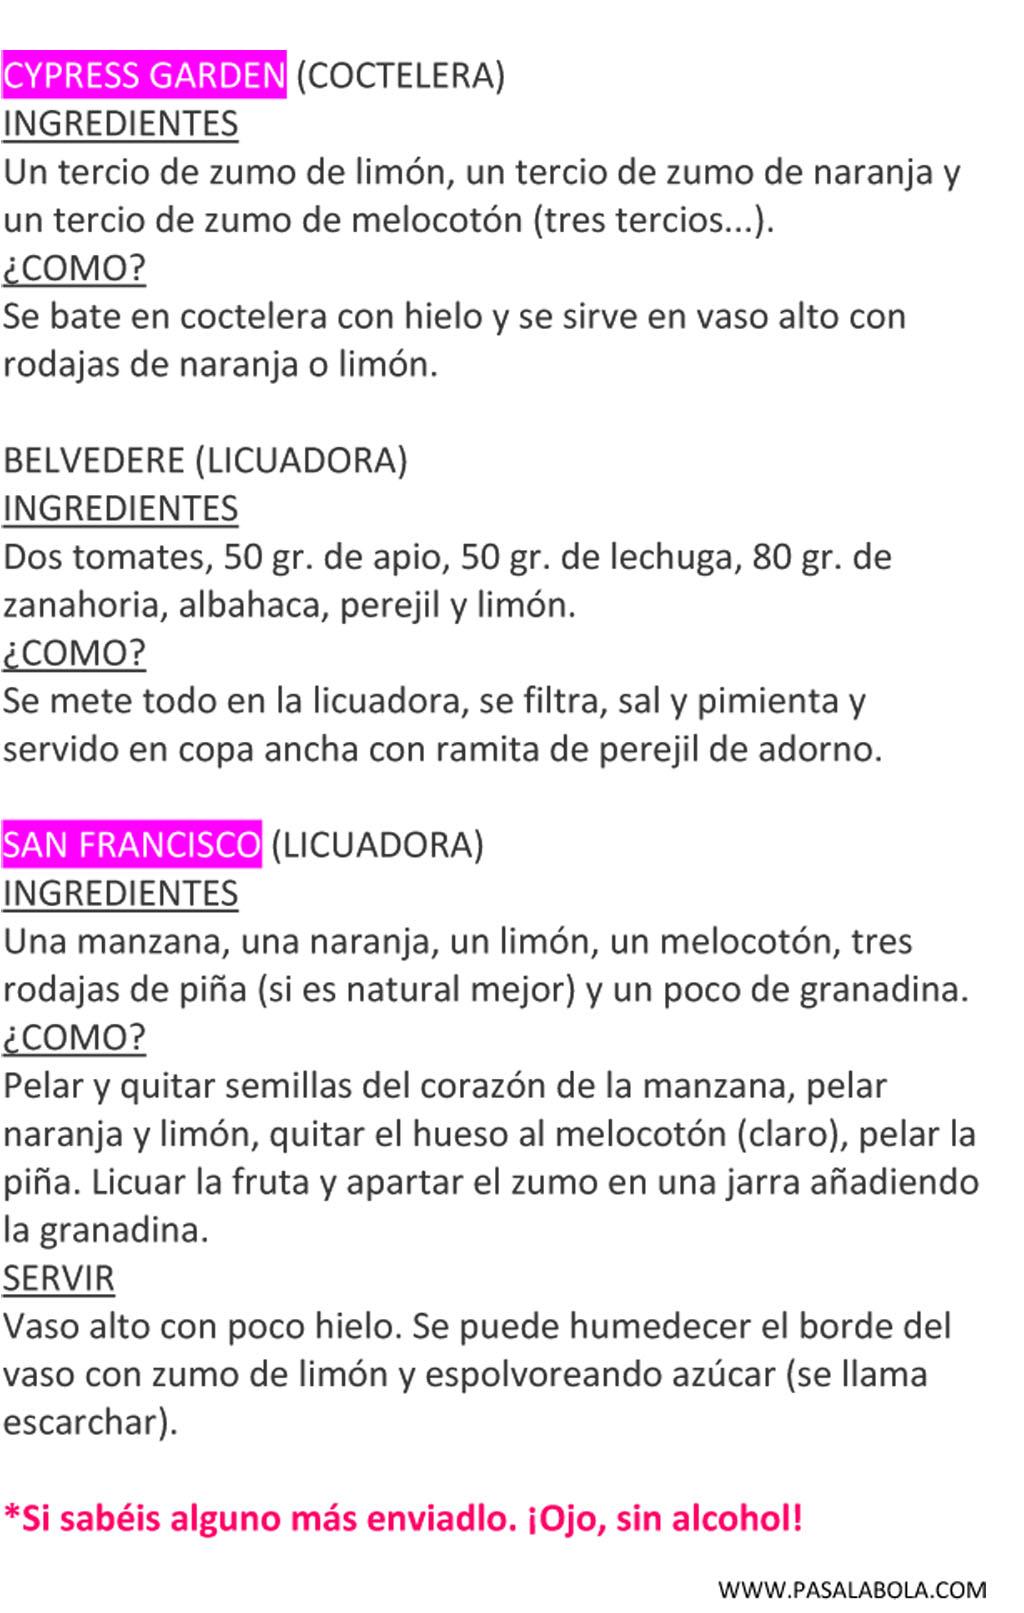 COCTELES SIN ALCOHOL-2